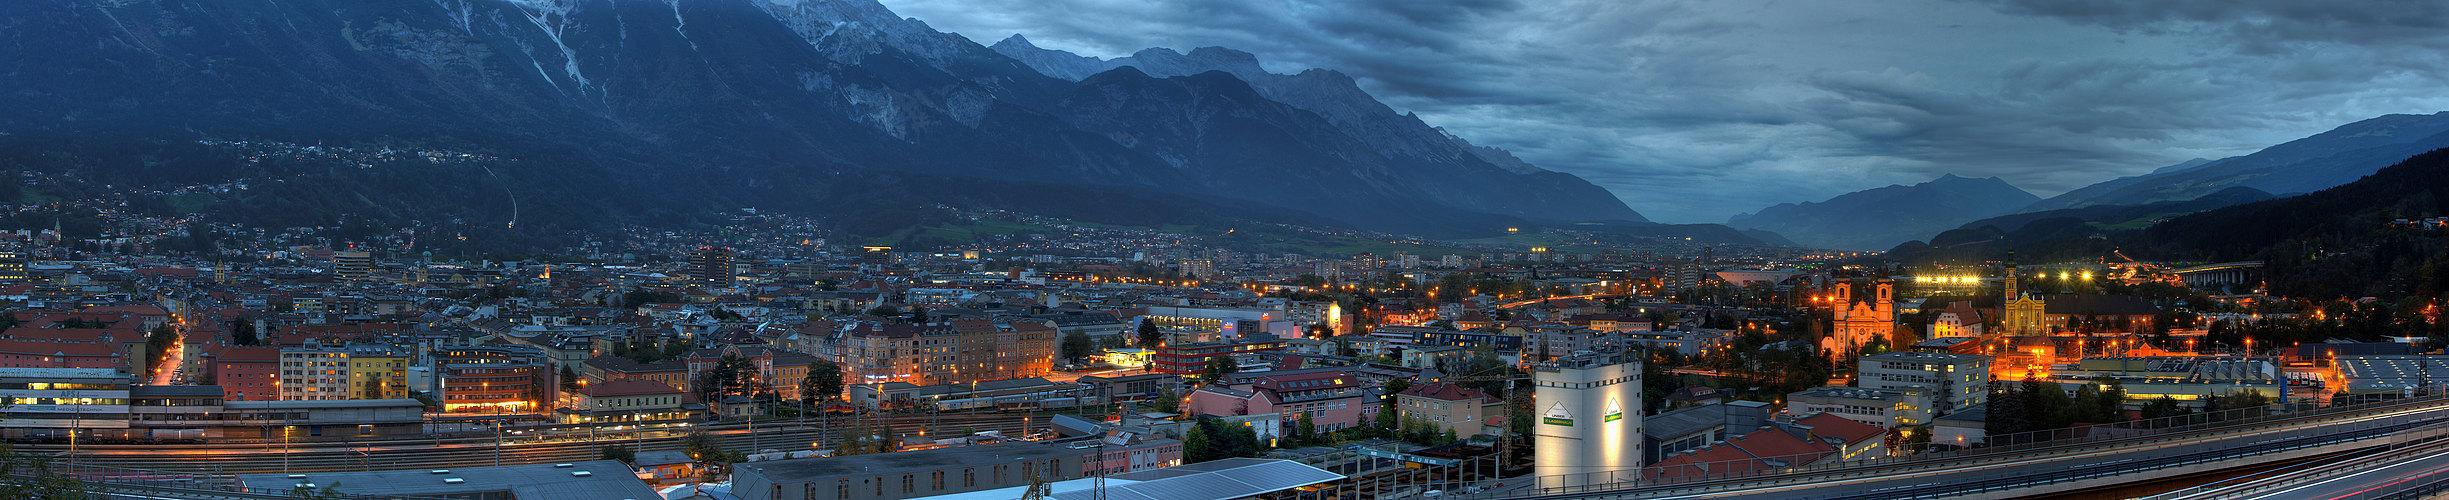 Innsbrucker Panorama